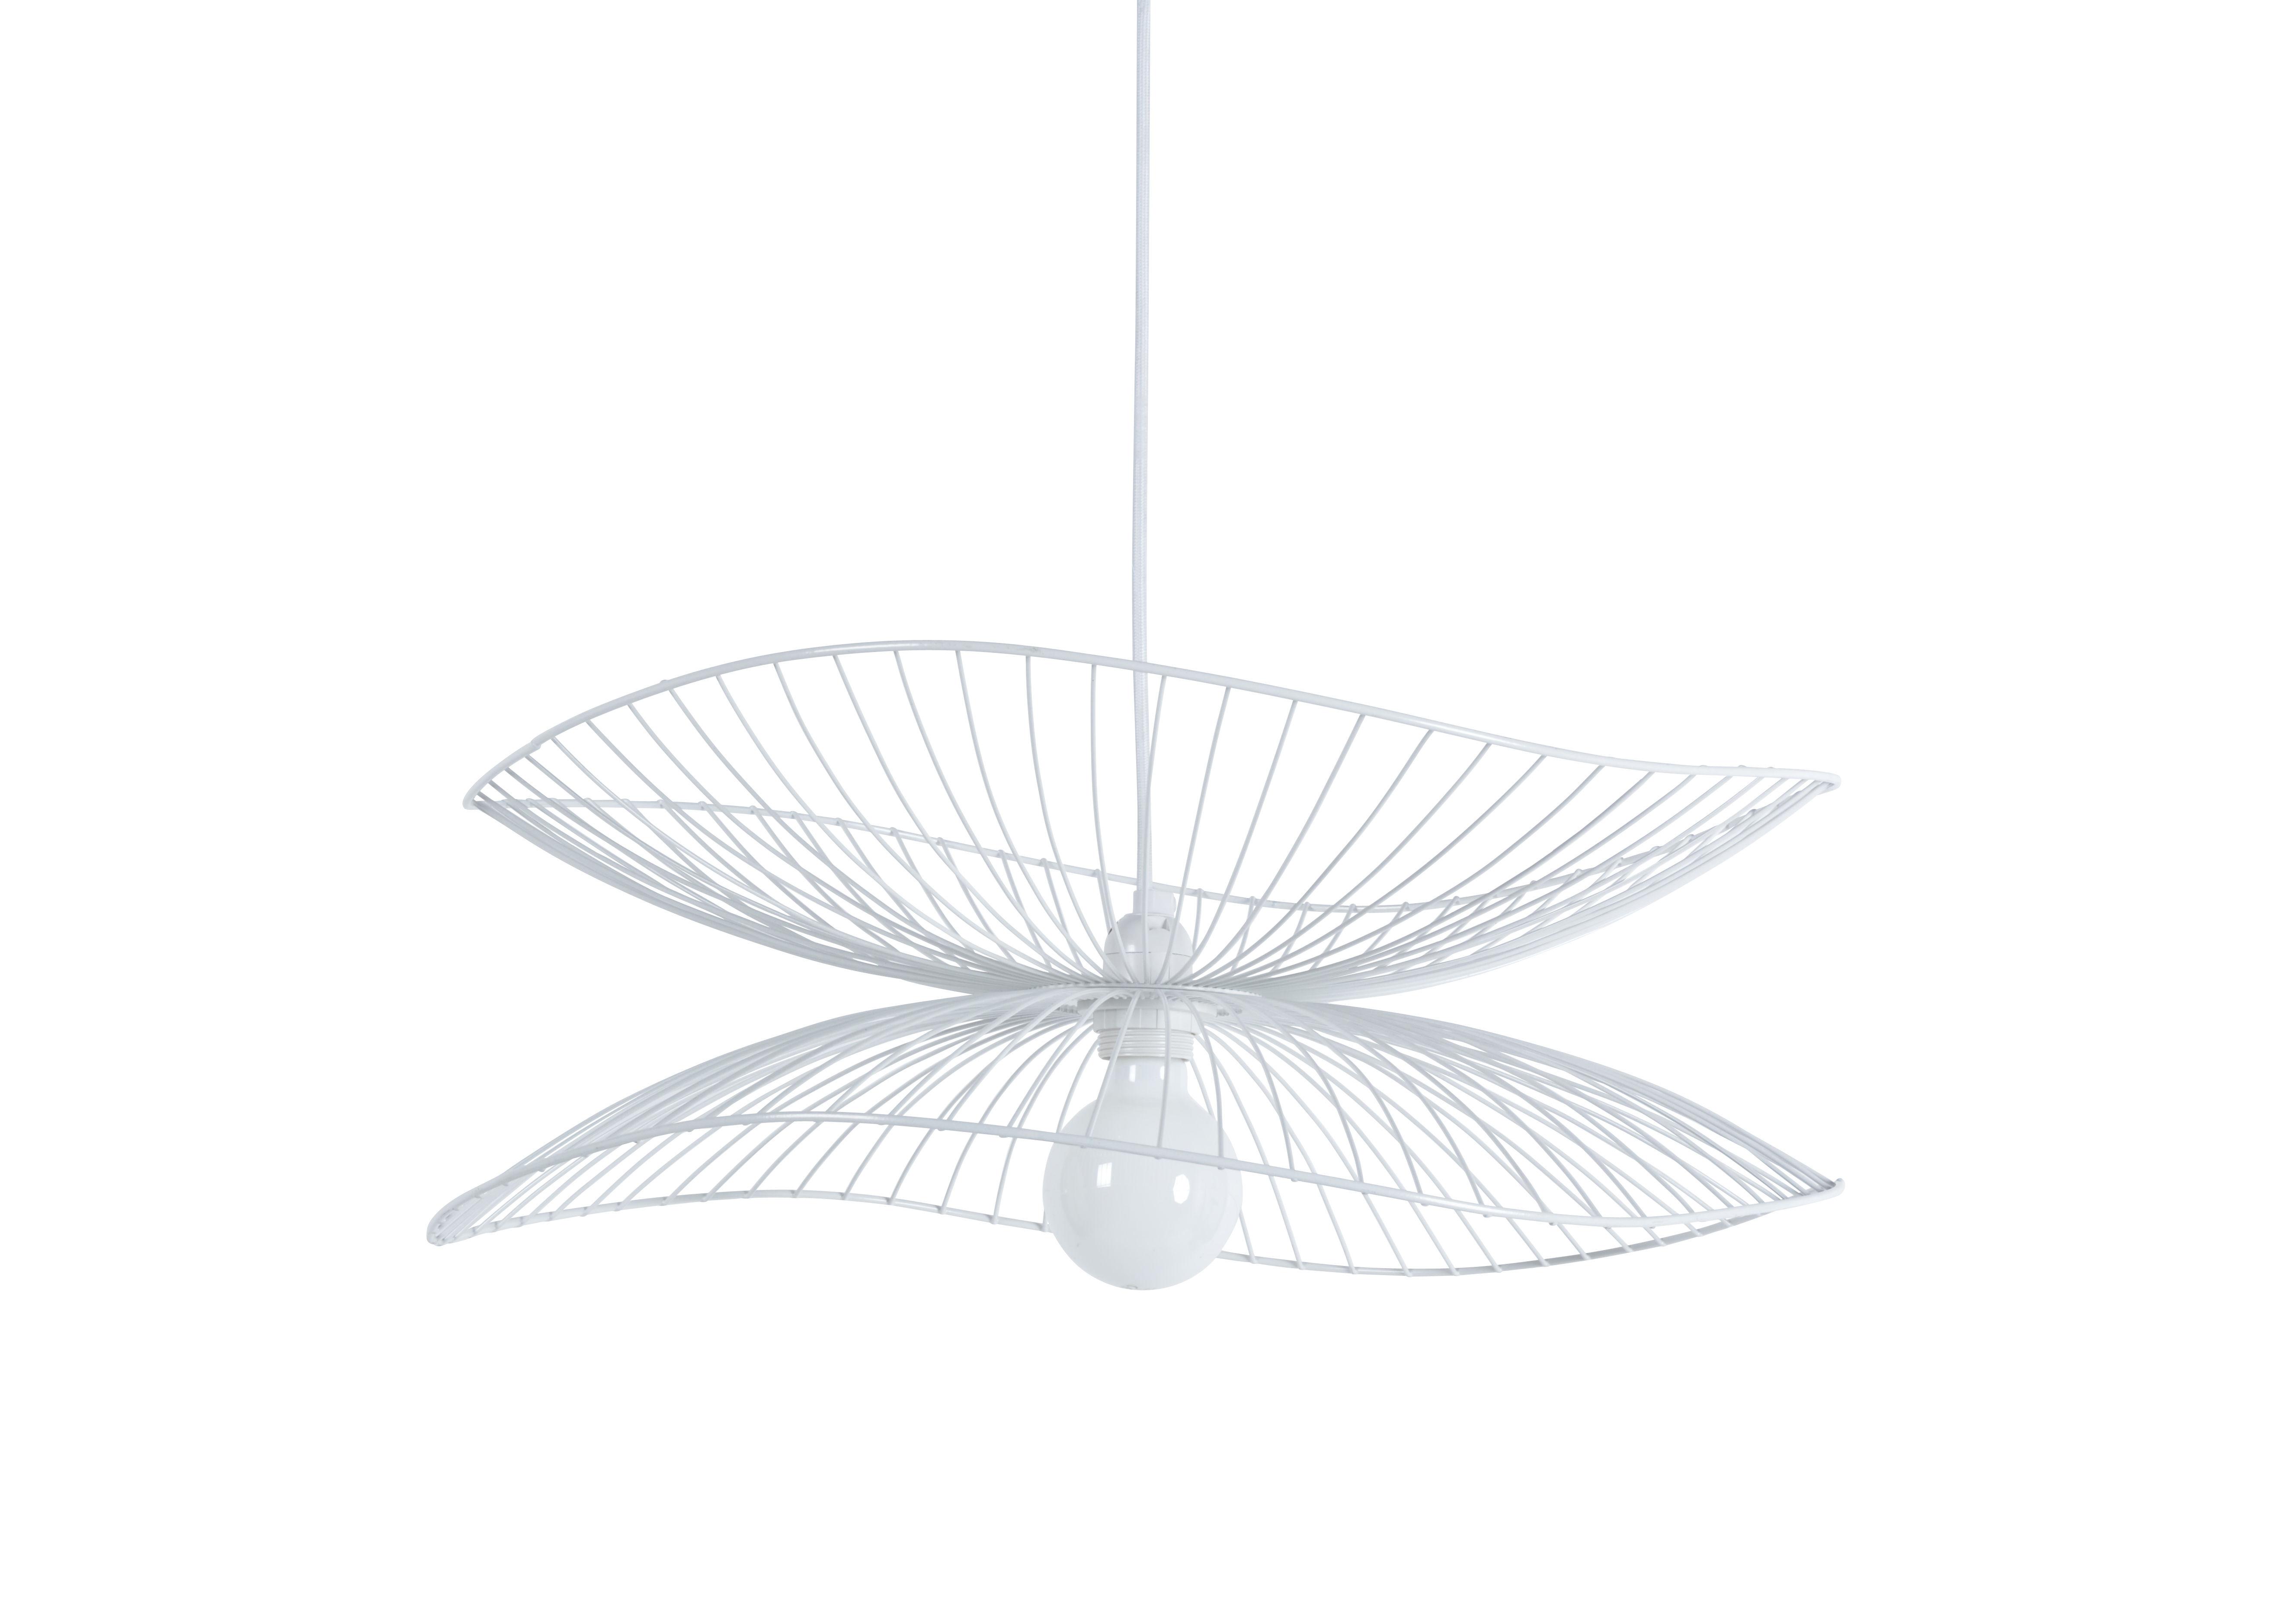 Illuminazione - Lampadari - Sospensione Libellule Small - / Ø 56 x H 20 cm di Forestier - Bianco - Fils de fer laqués